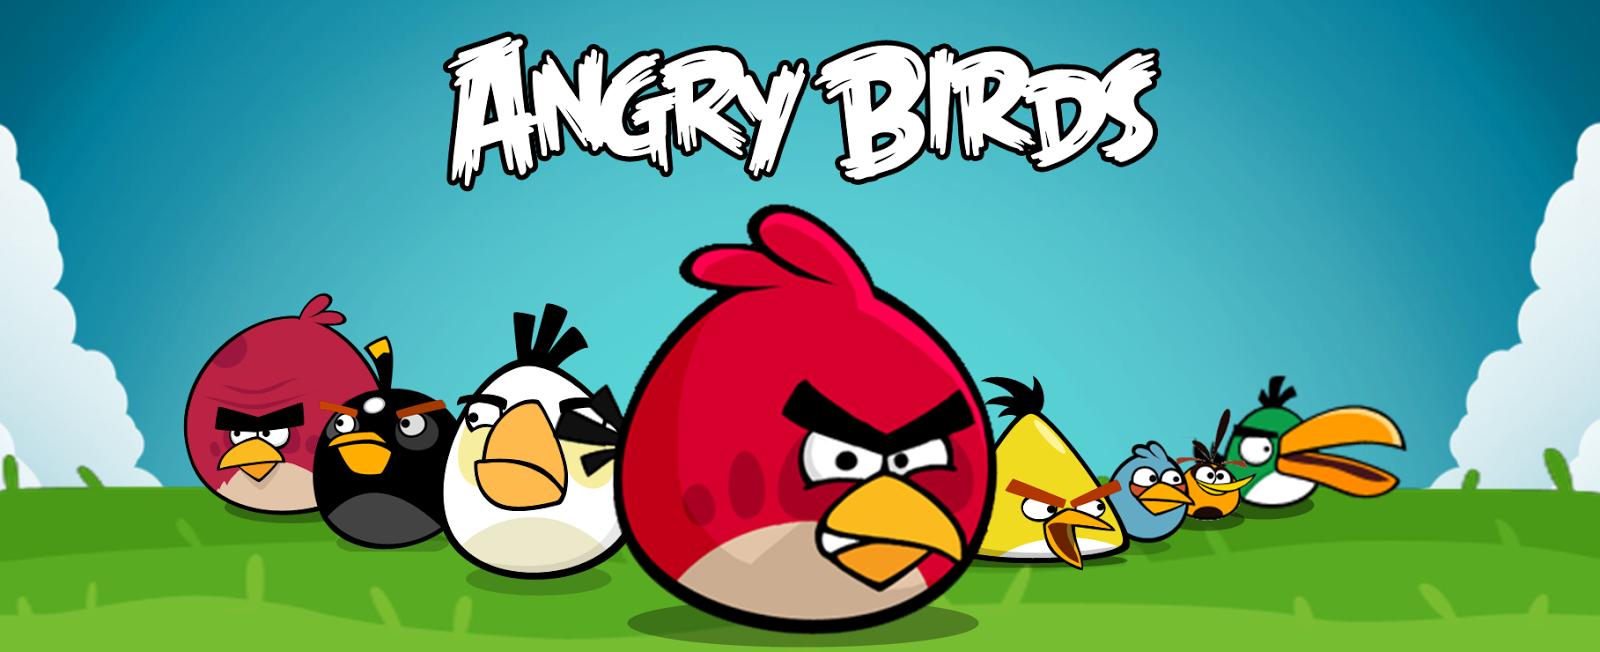 Web Dev NET Angry Birds of JavaScript Green Bird   Mocking 1600x652